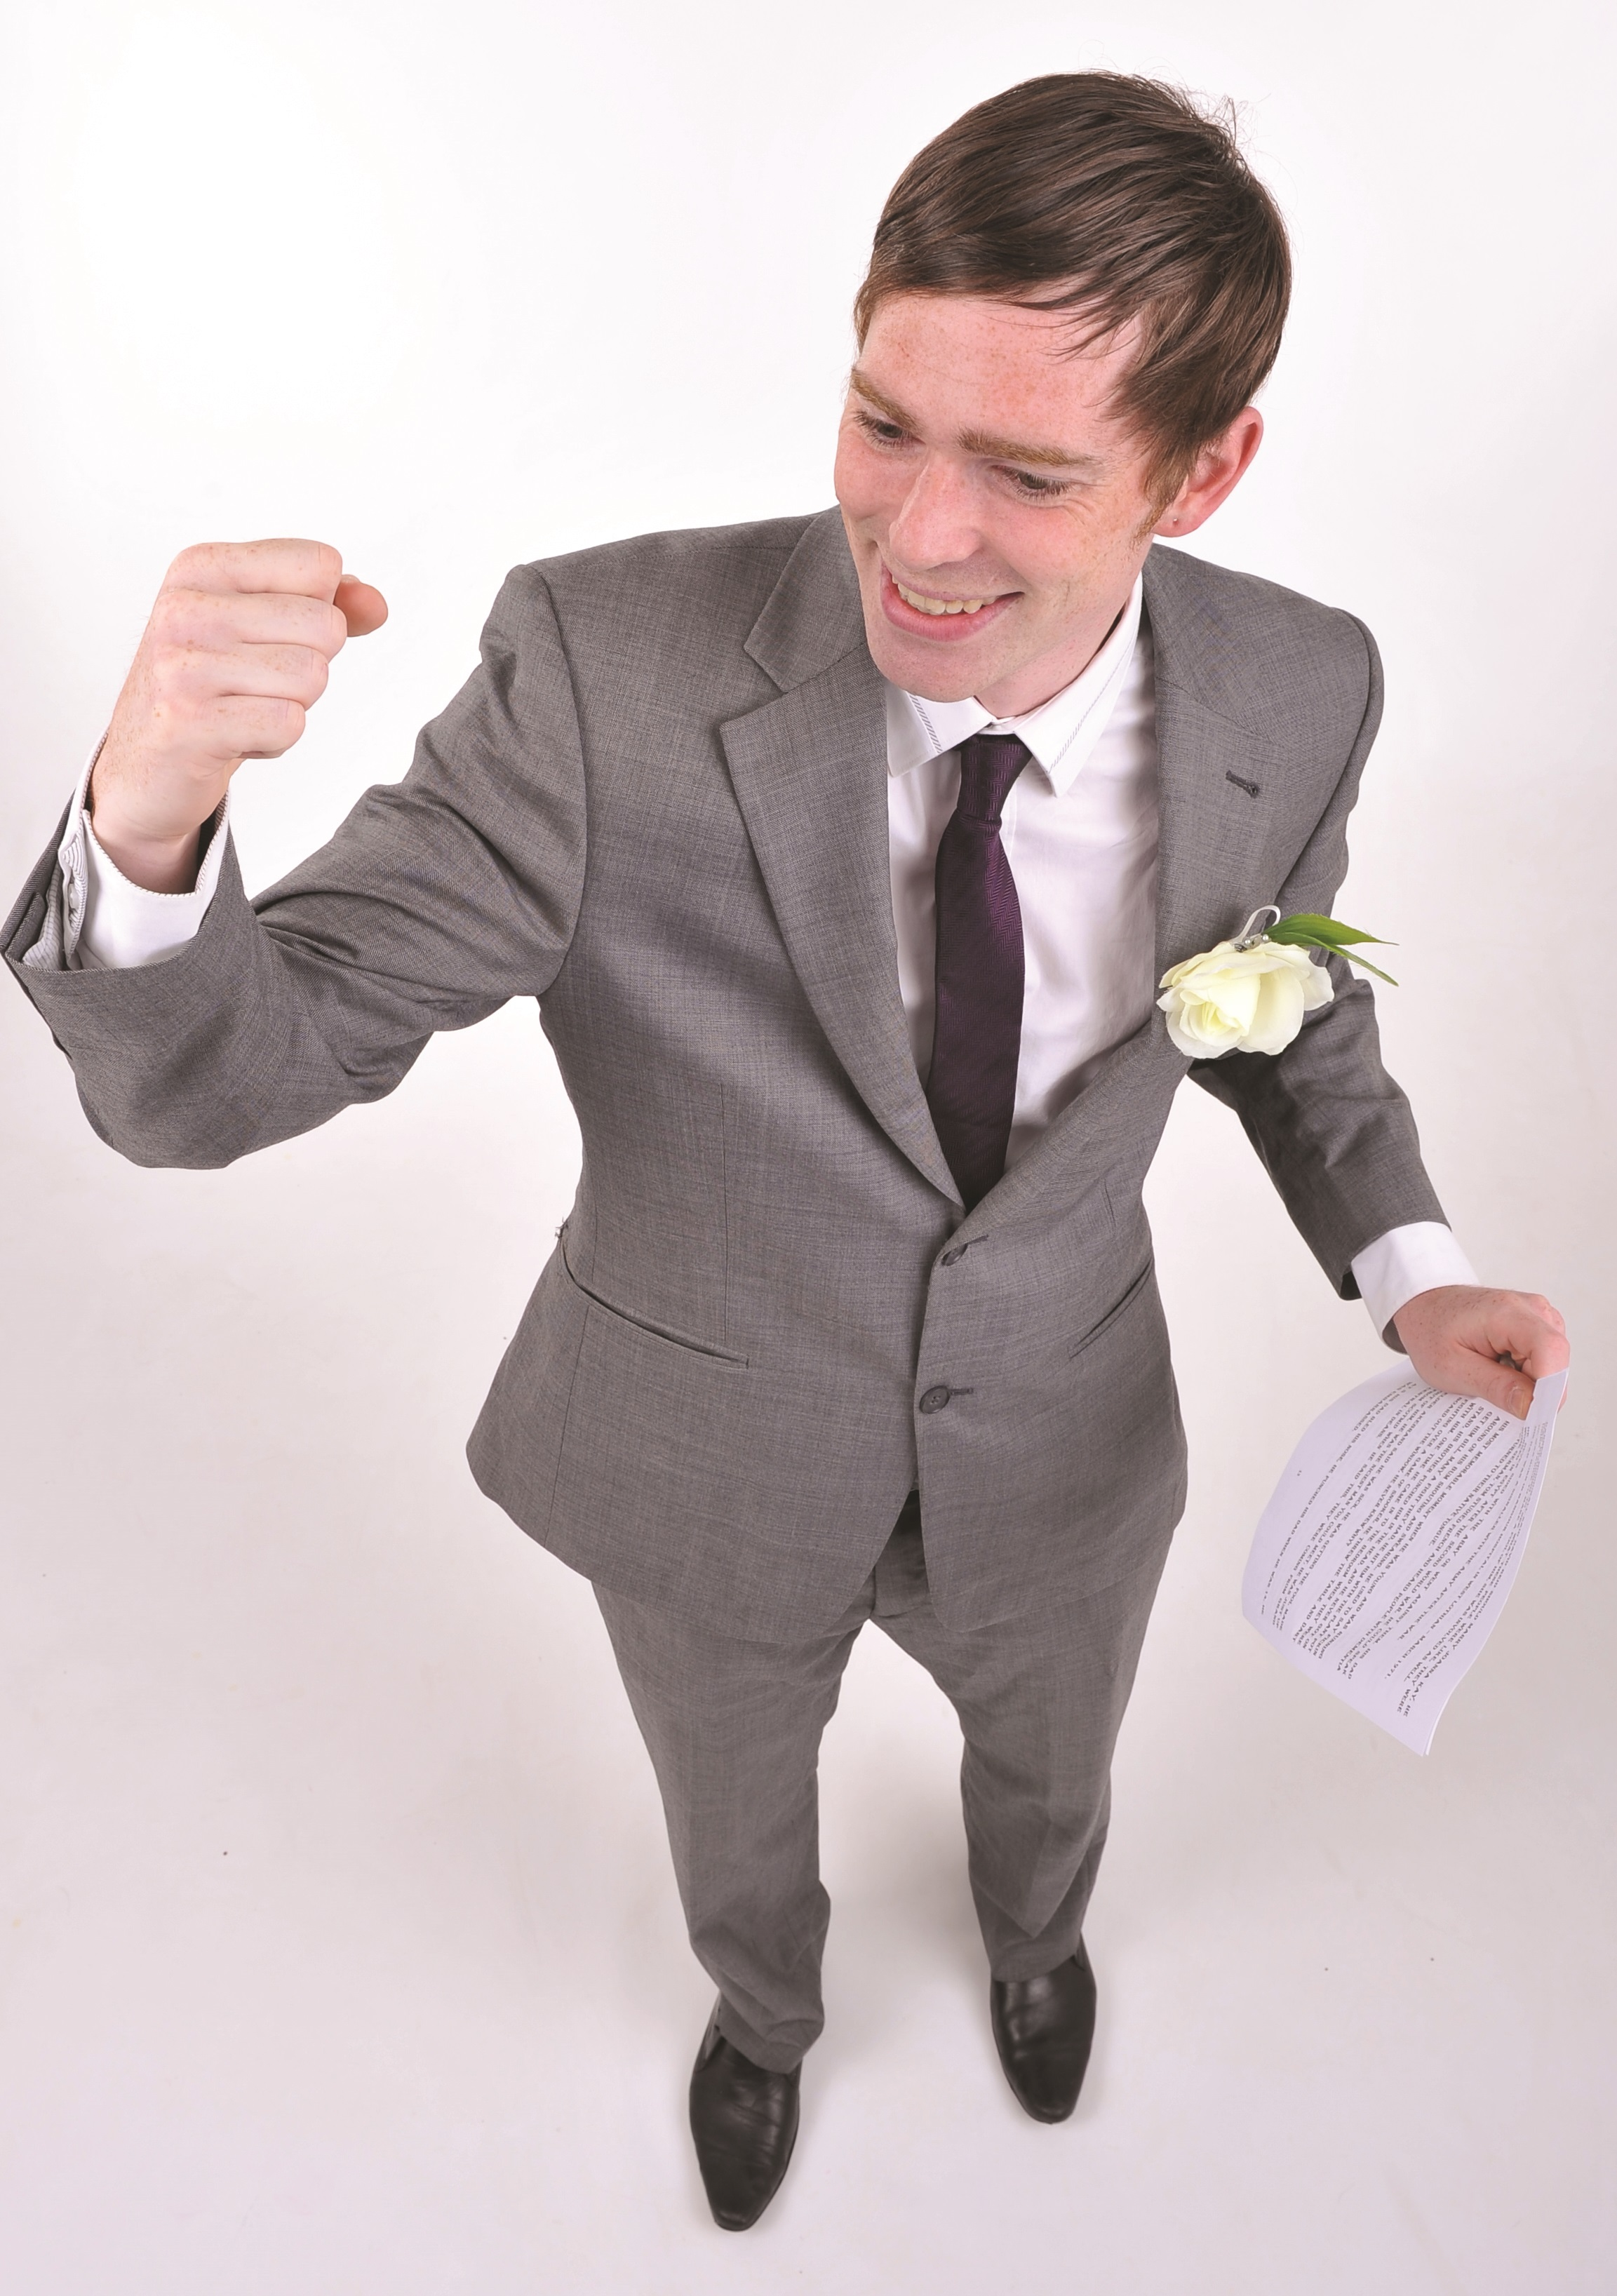 image-wedding-speech-success.jpg